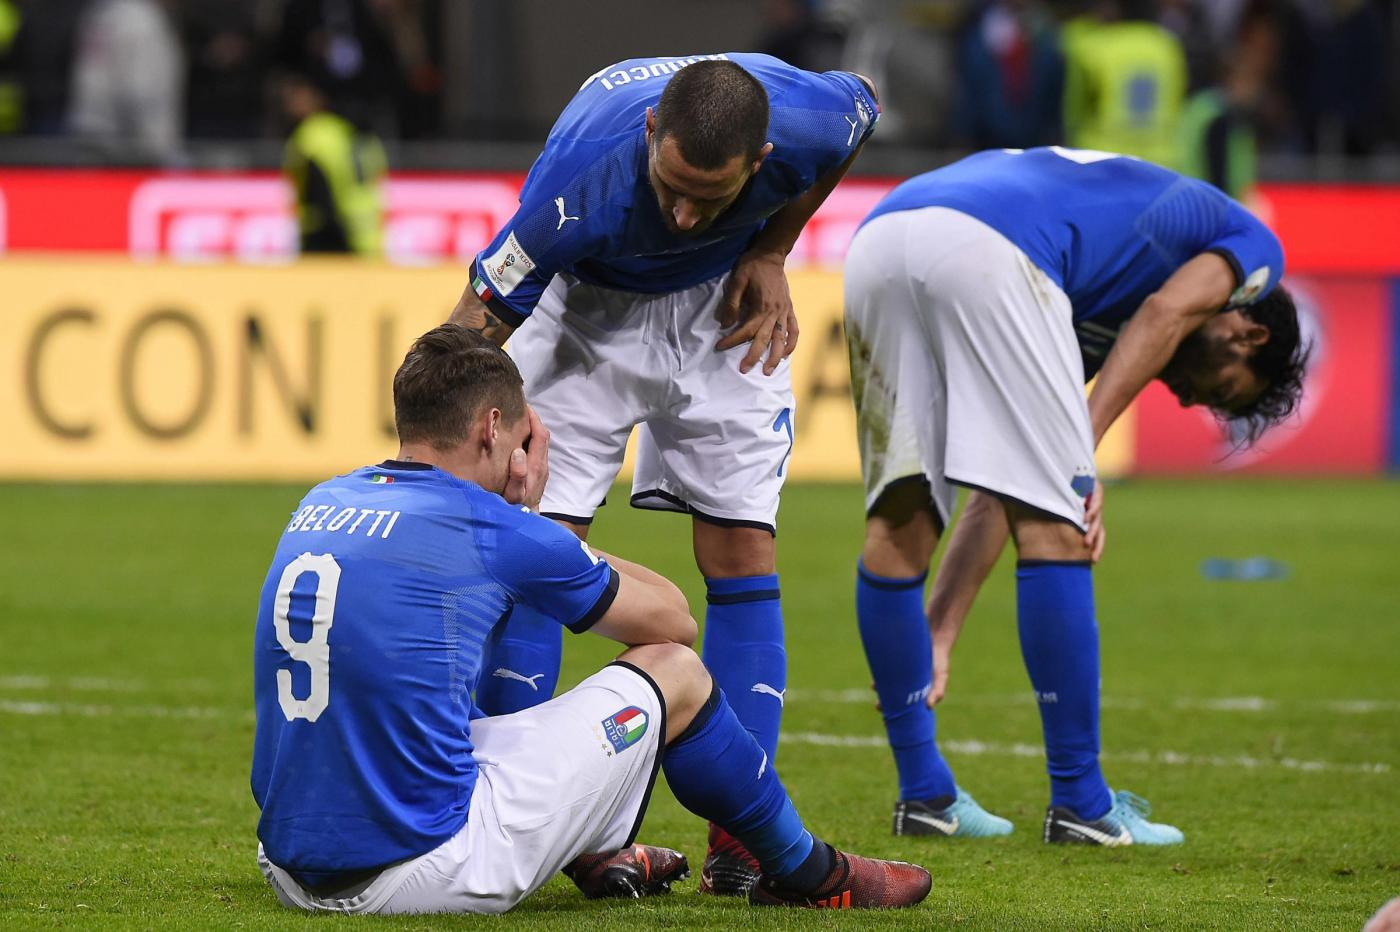 Retroscena Italia: Ventura voleva dimettersi dopo il ko in Svezia